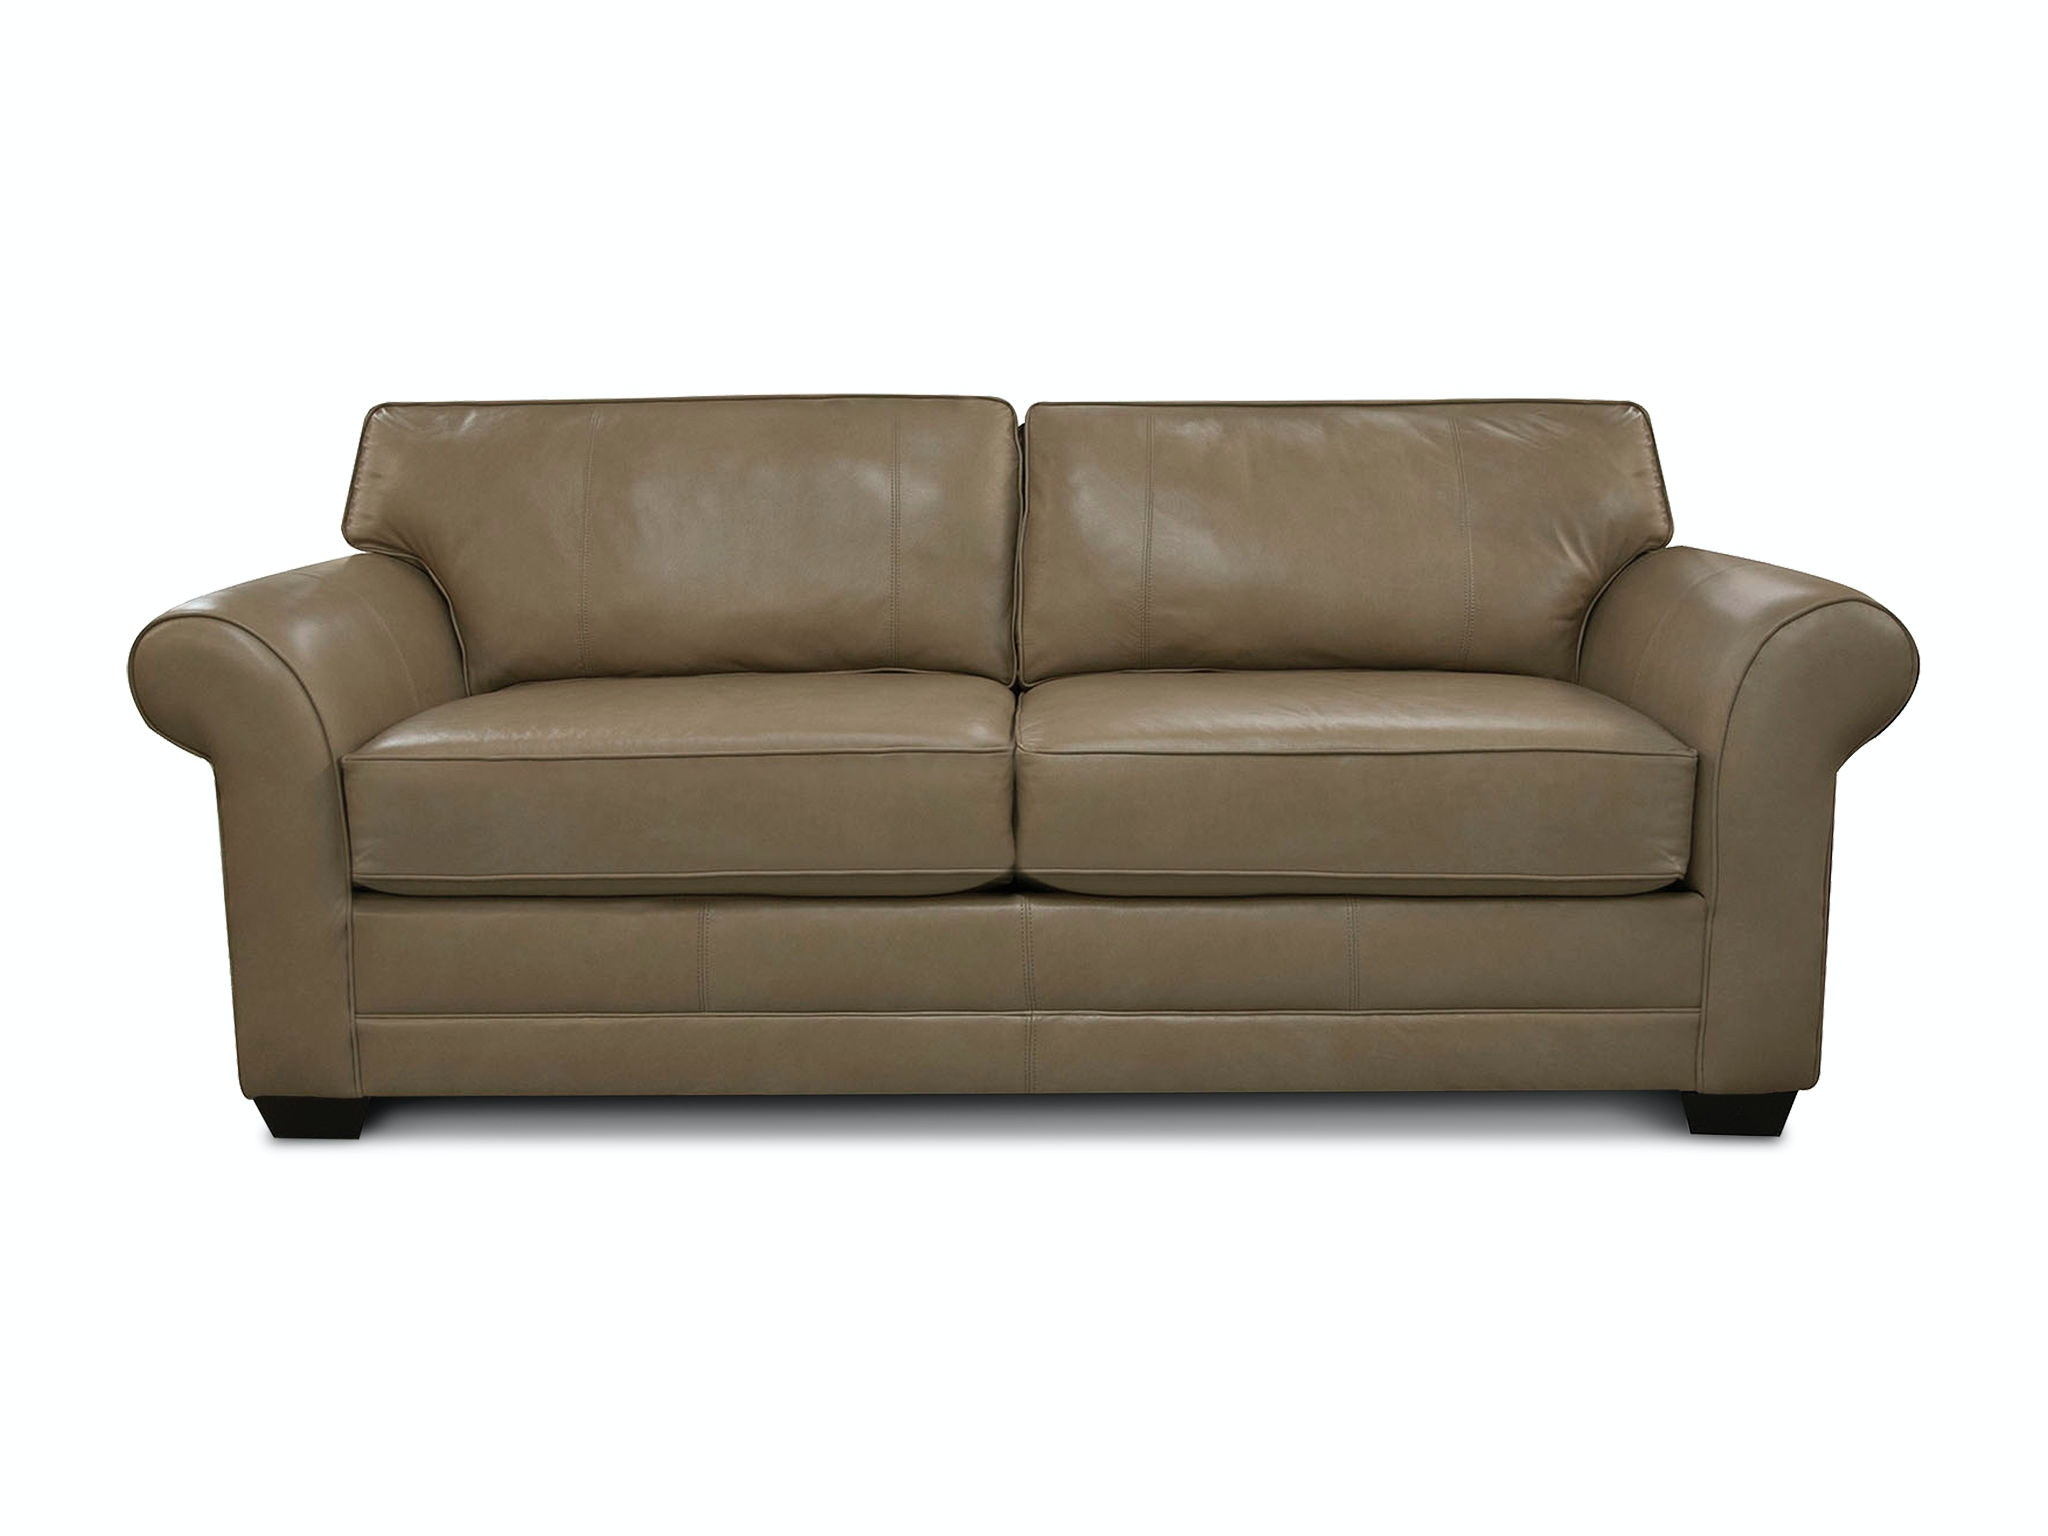 Incroyable 5635AL Landry Sofa